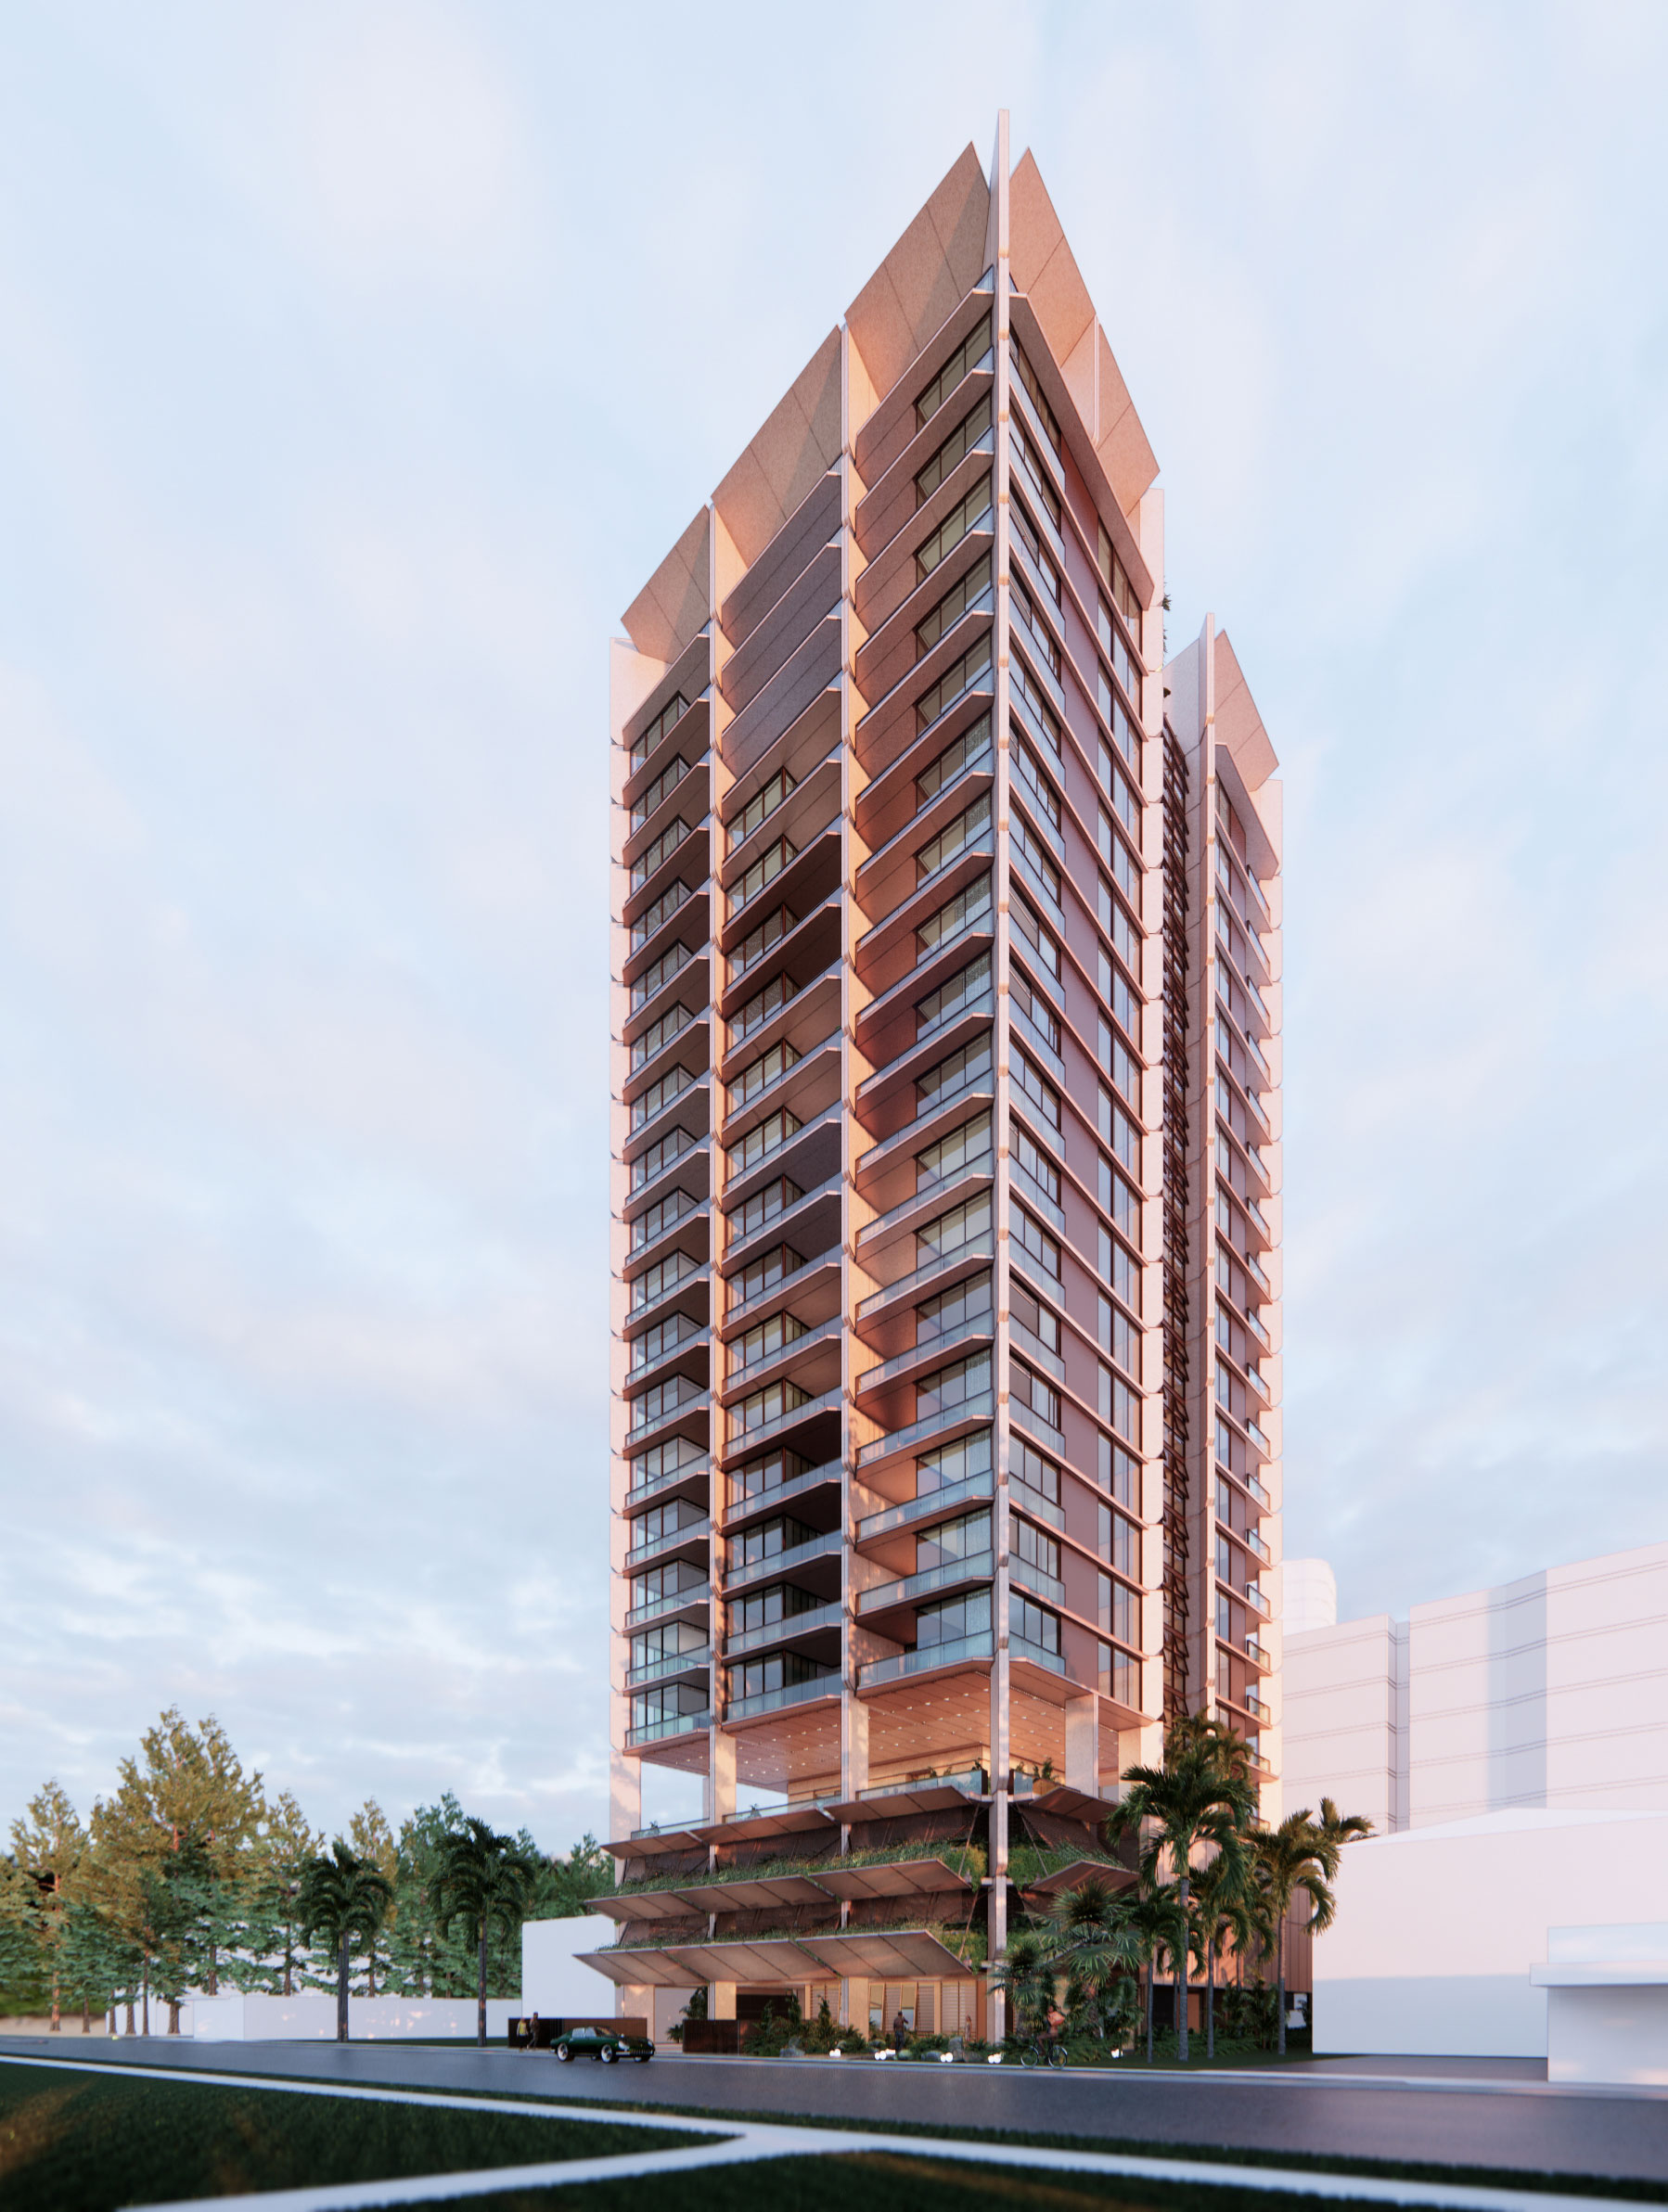 Turrisi Properties modernist coastal apartment tower to set design benchmark in Broadbeach.